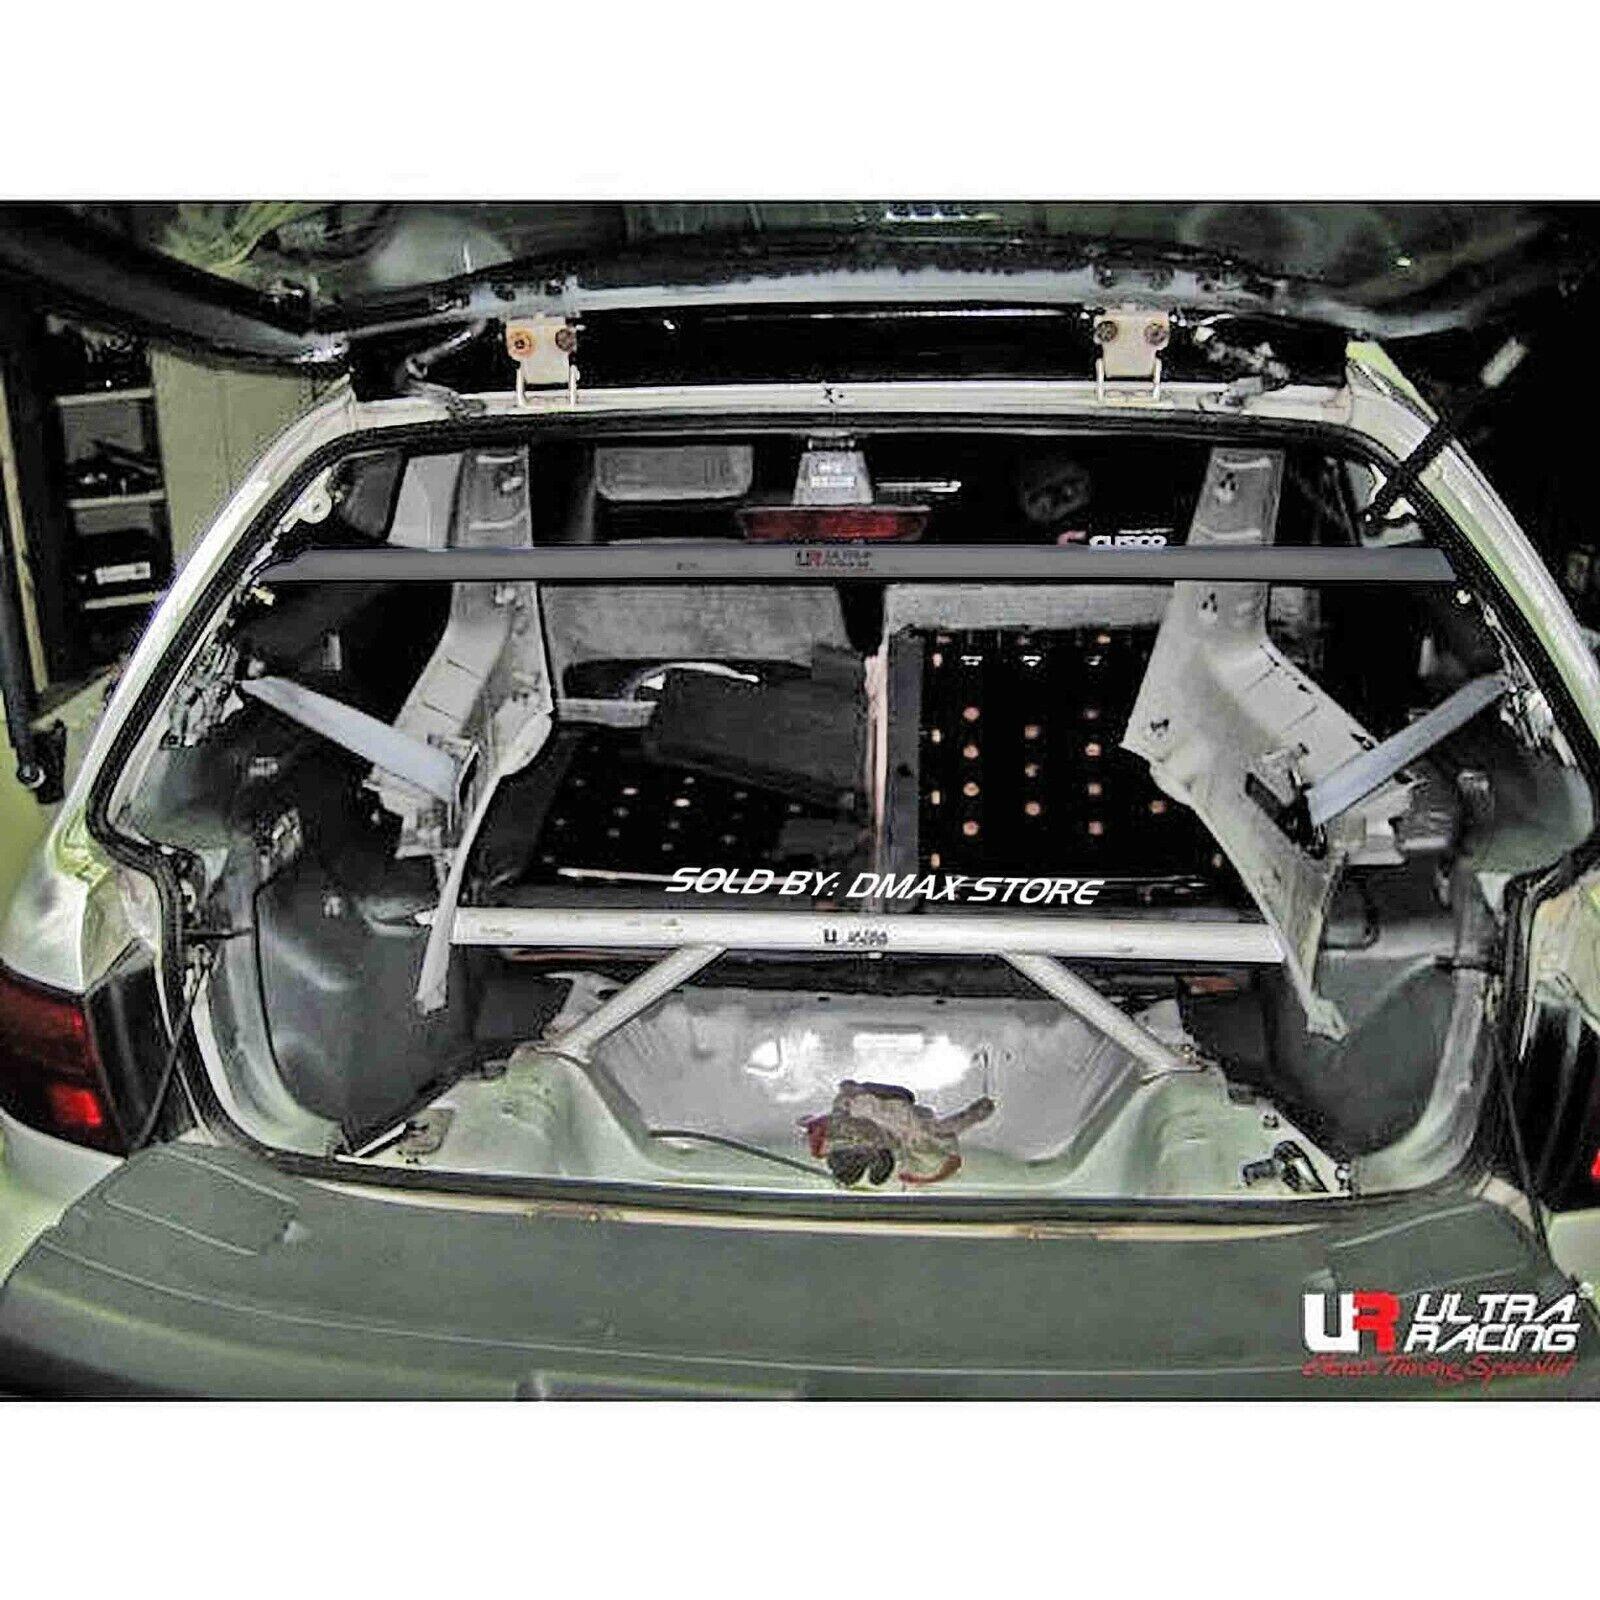 UR-RE4-021 HONDA CIVIC EG EK INTEGRA DC2 ULTRA RACING 4 POINTS REAR STRUT BAR